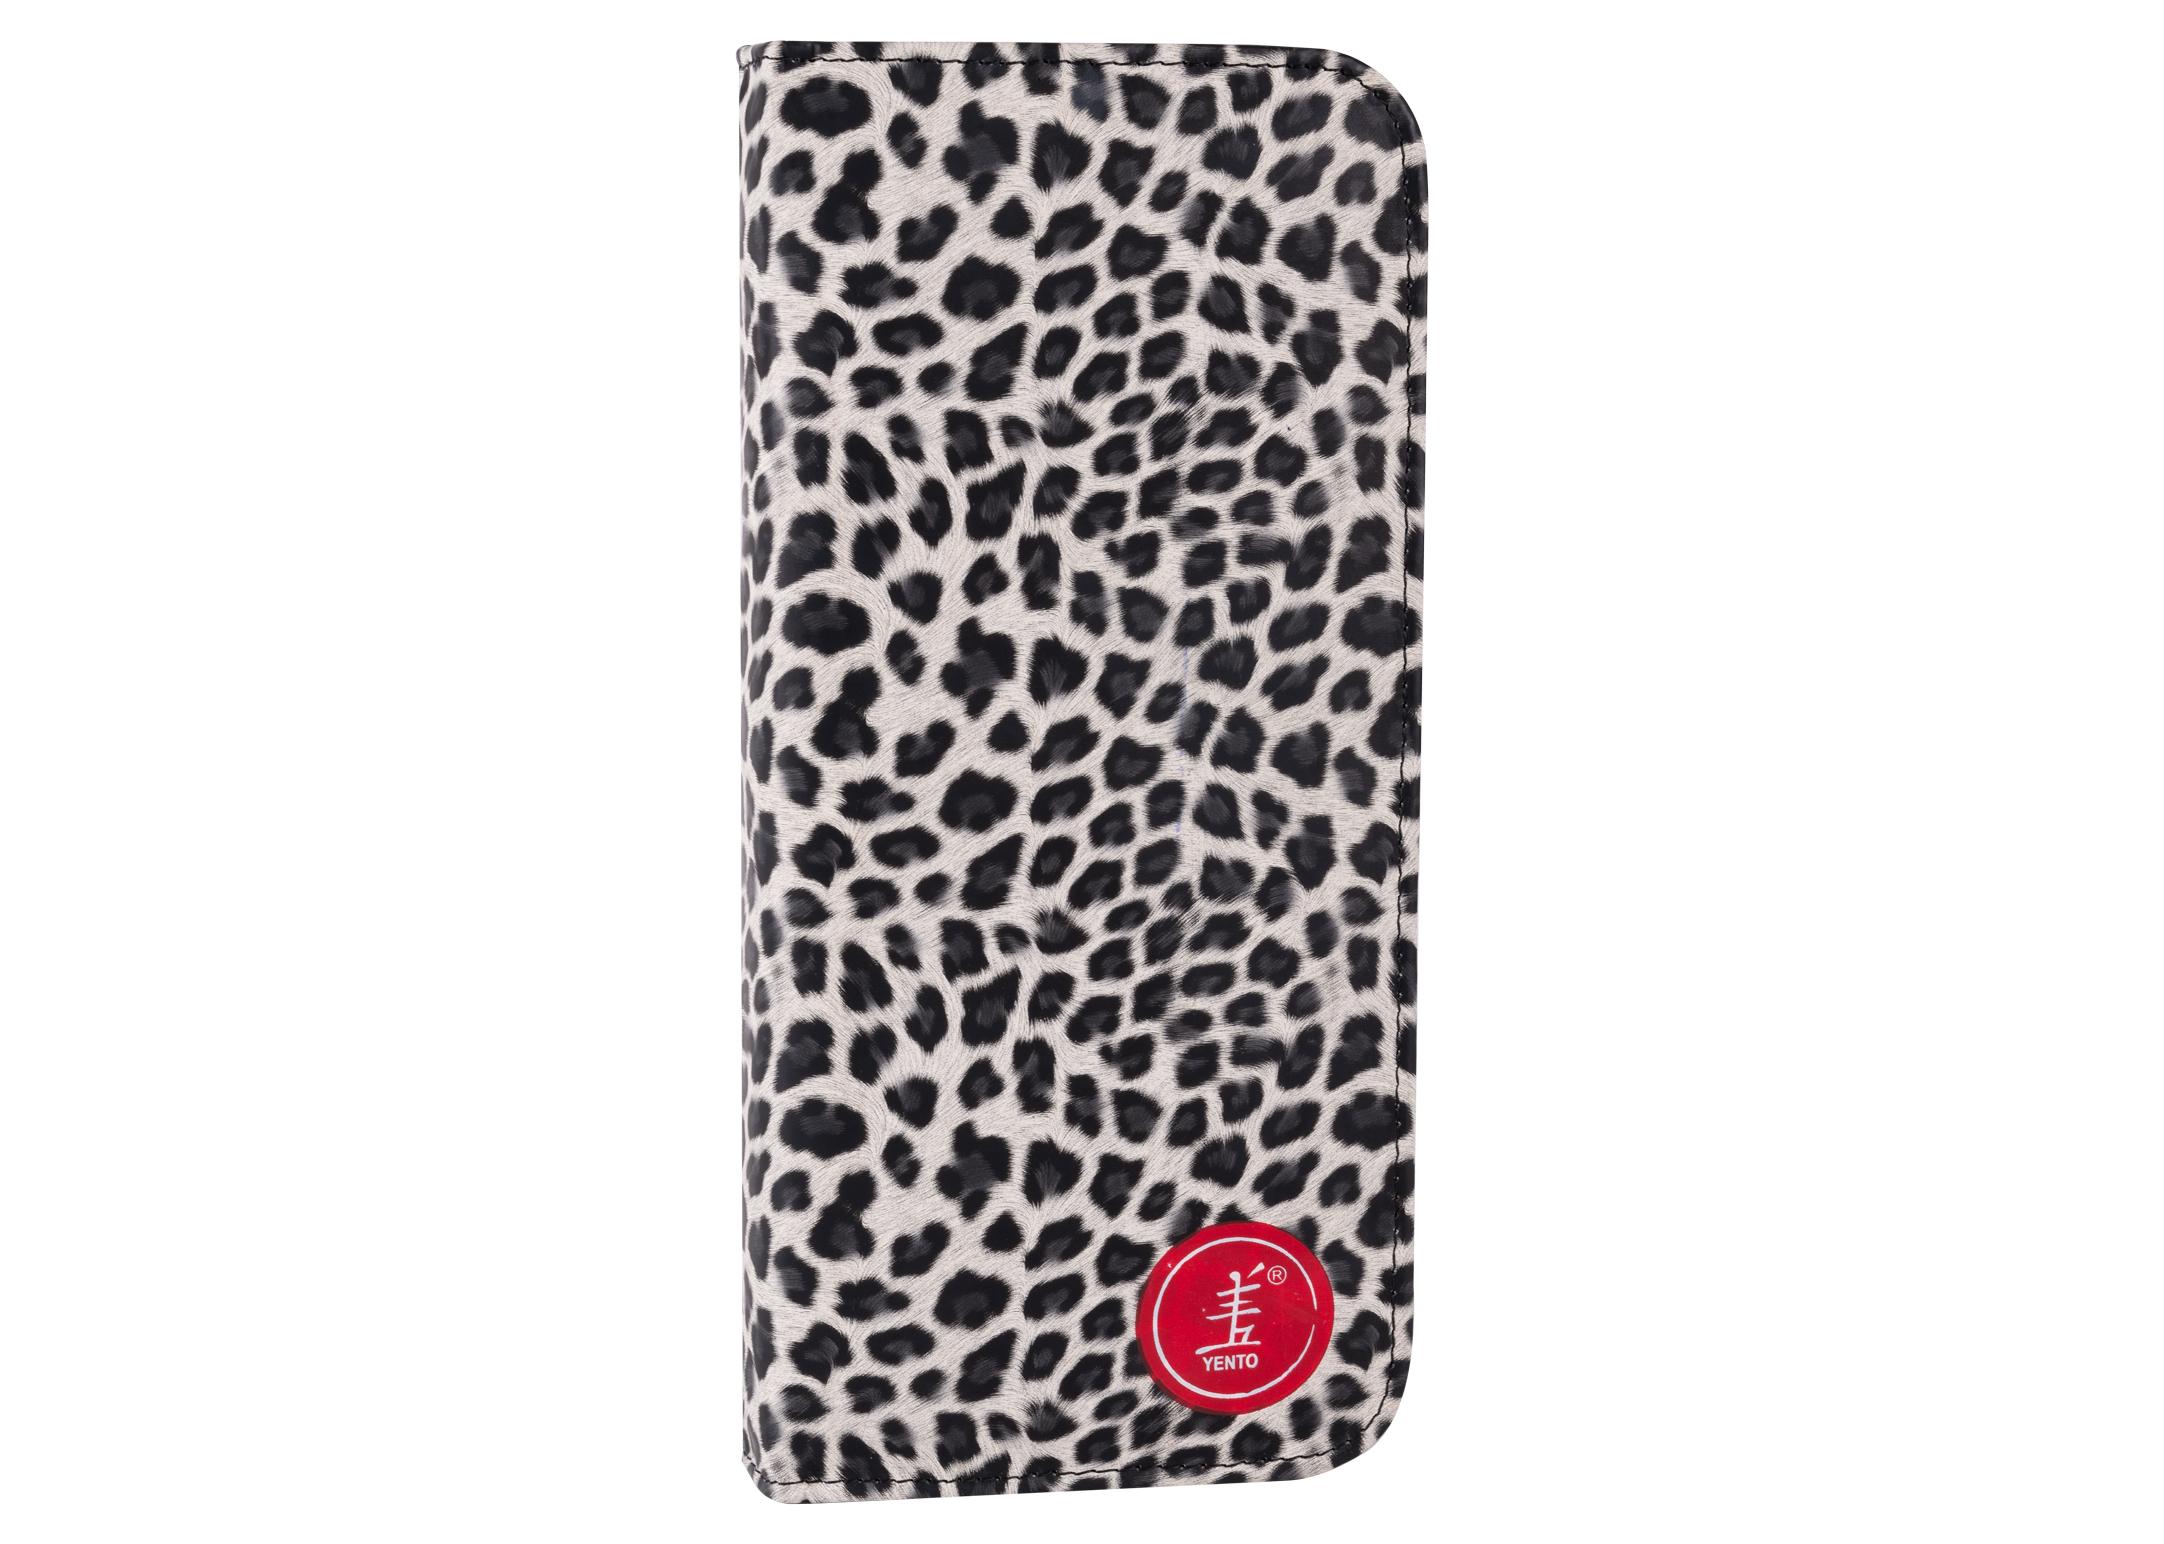 Yento Scissor Shear Pouch Leopard print - 12 scissors - 28x12,5cm